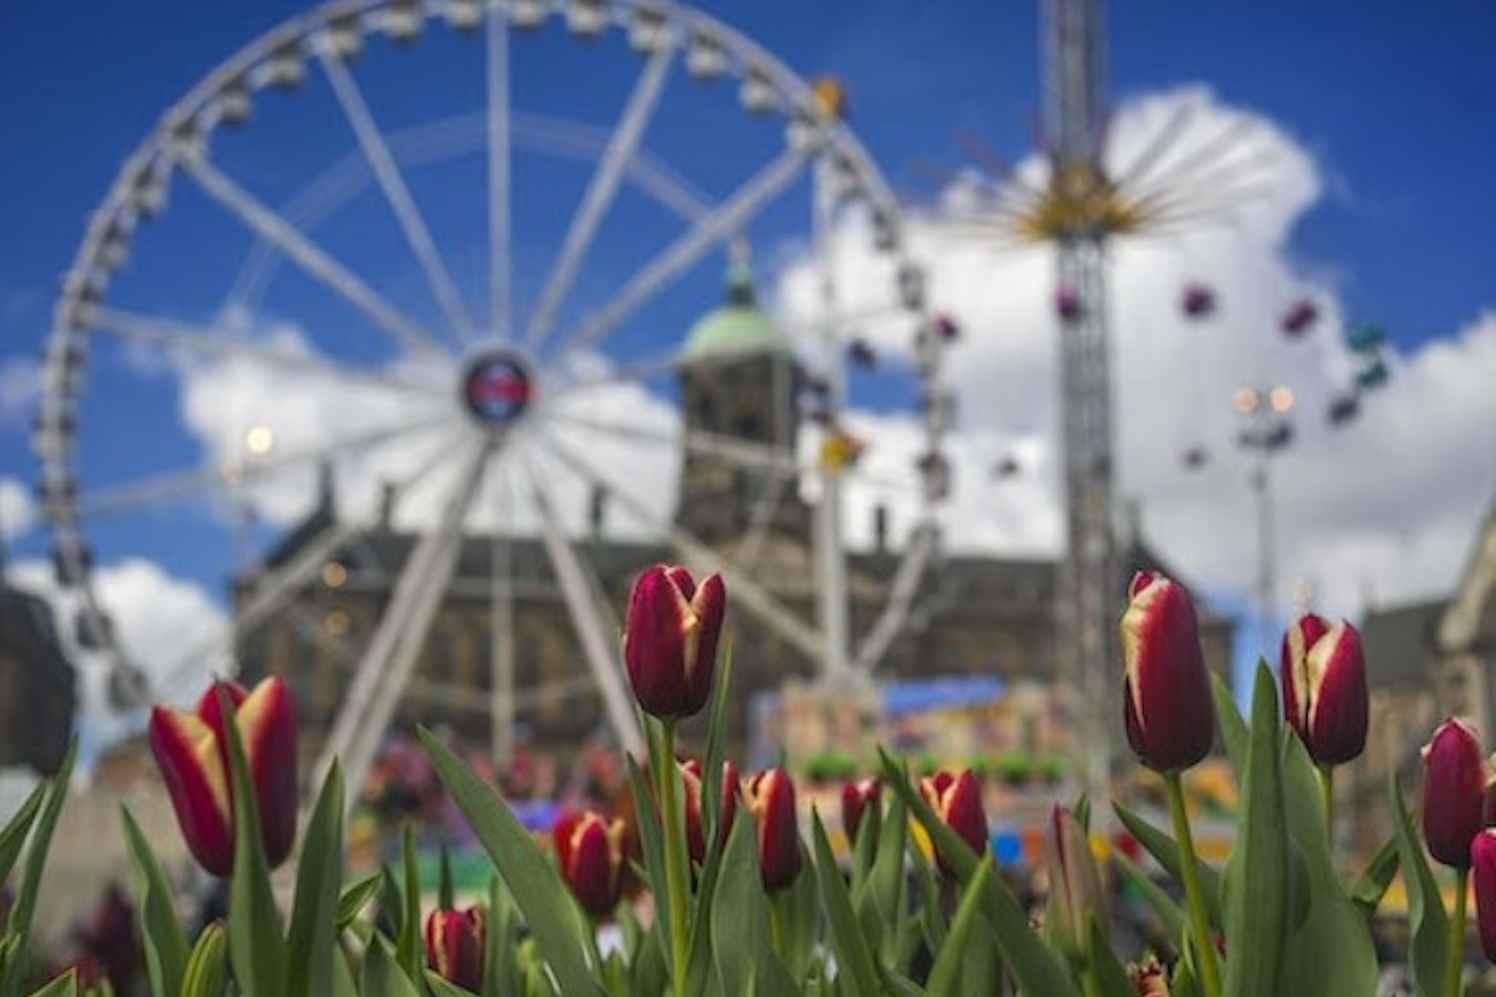 Tulp Festival bollenplanttijd